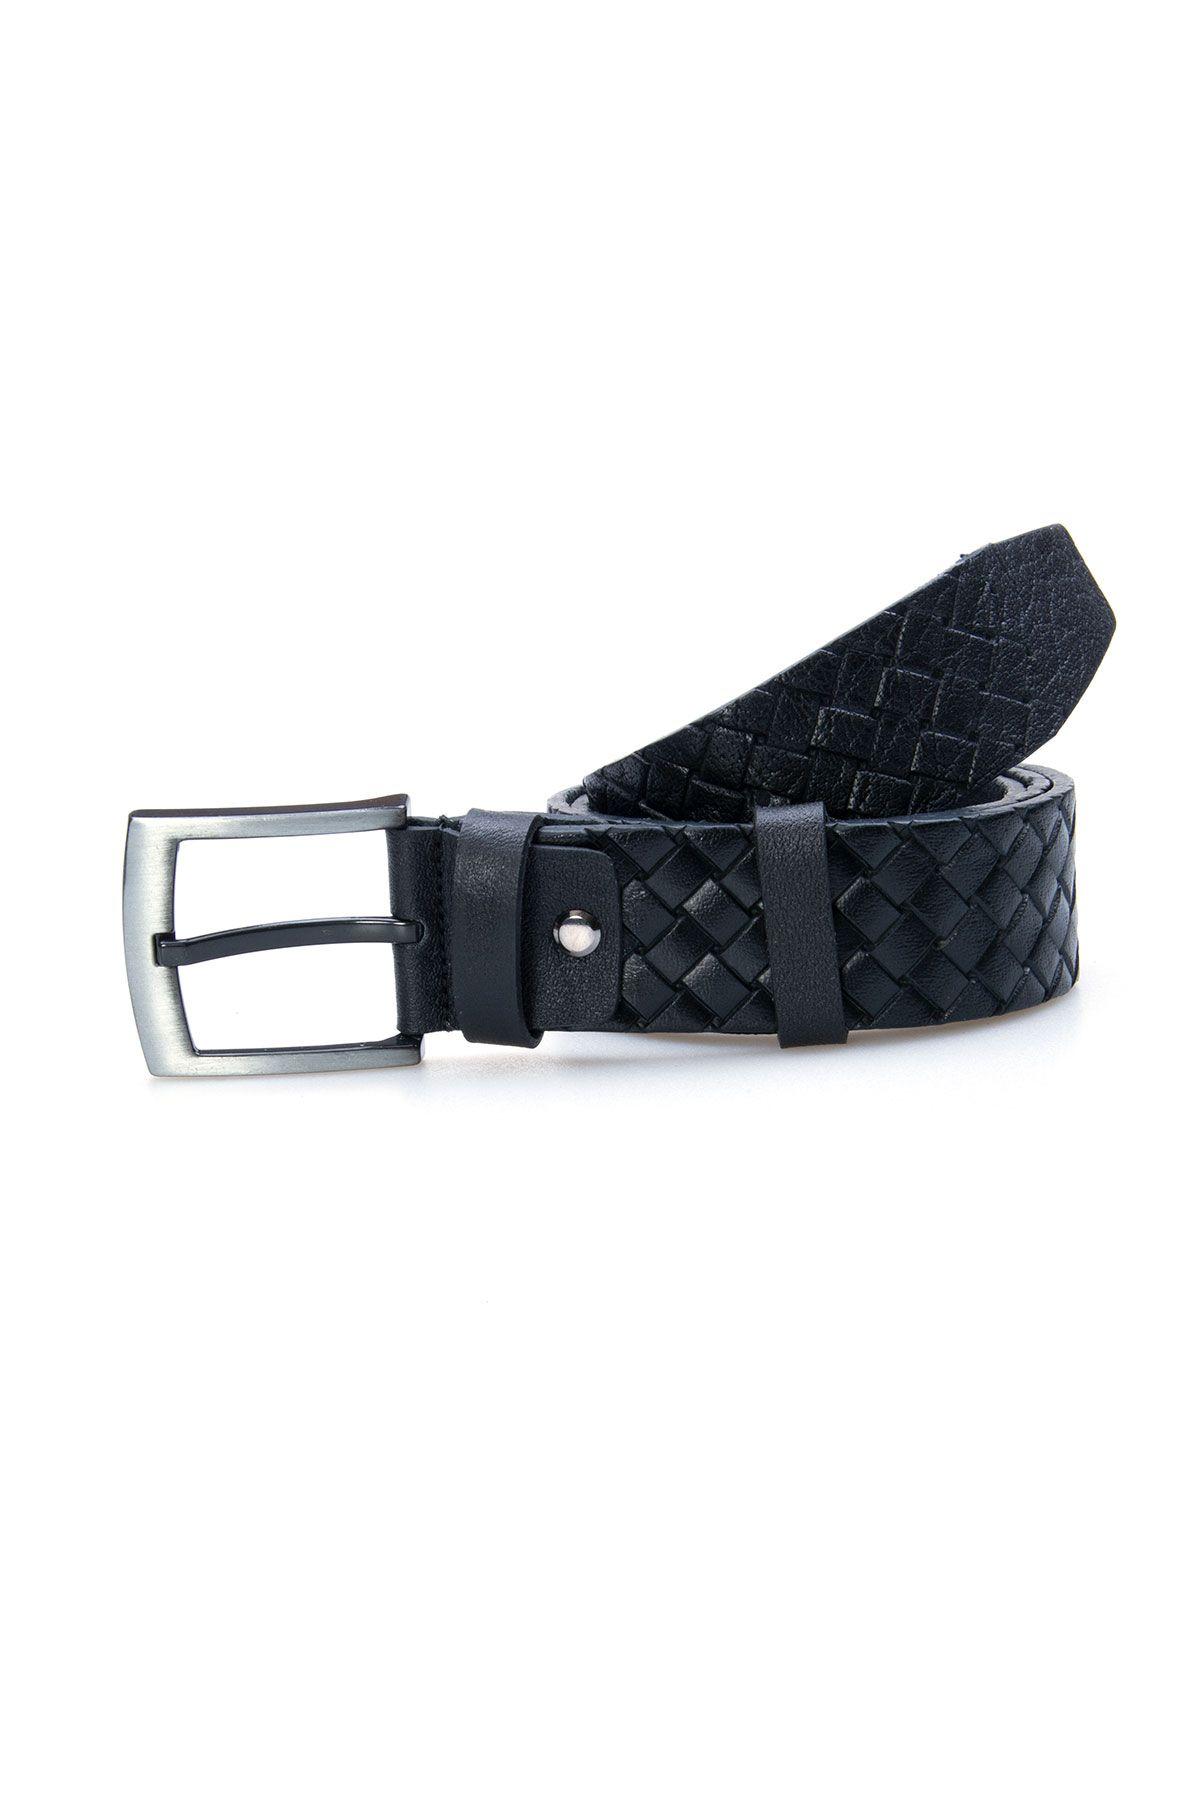 Pegia Genuine Leather Men's Belt 19KMR10 Black